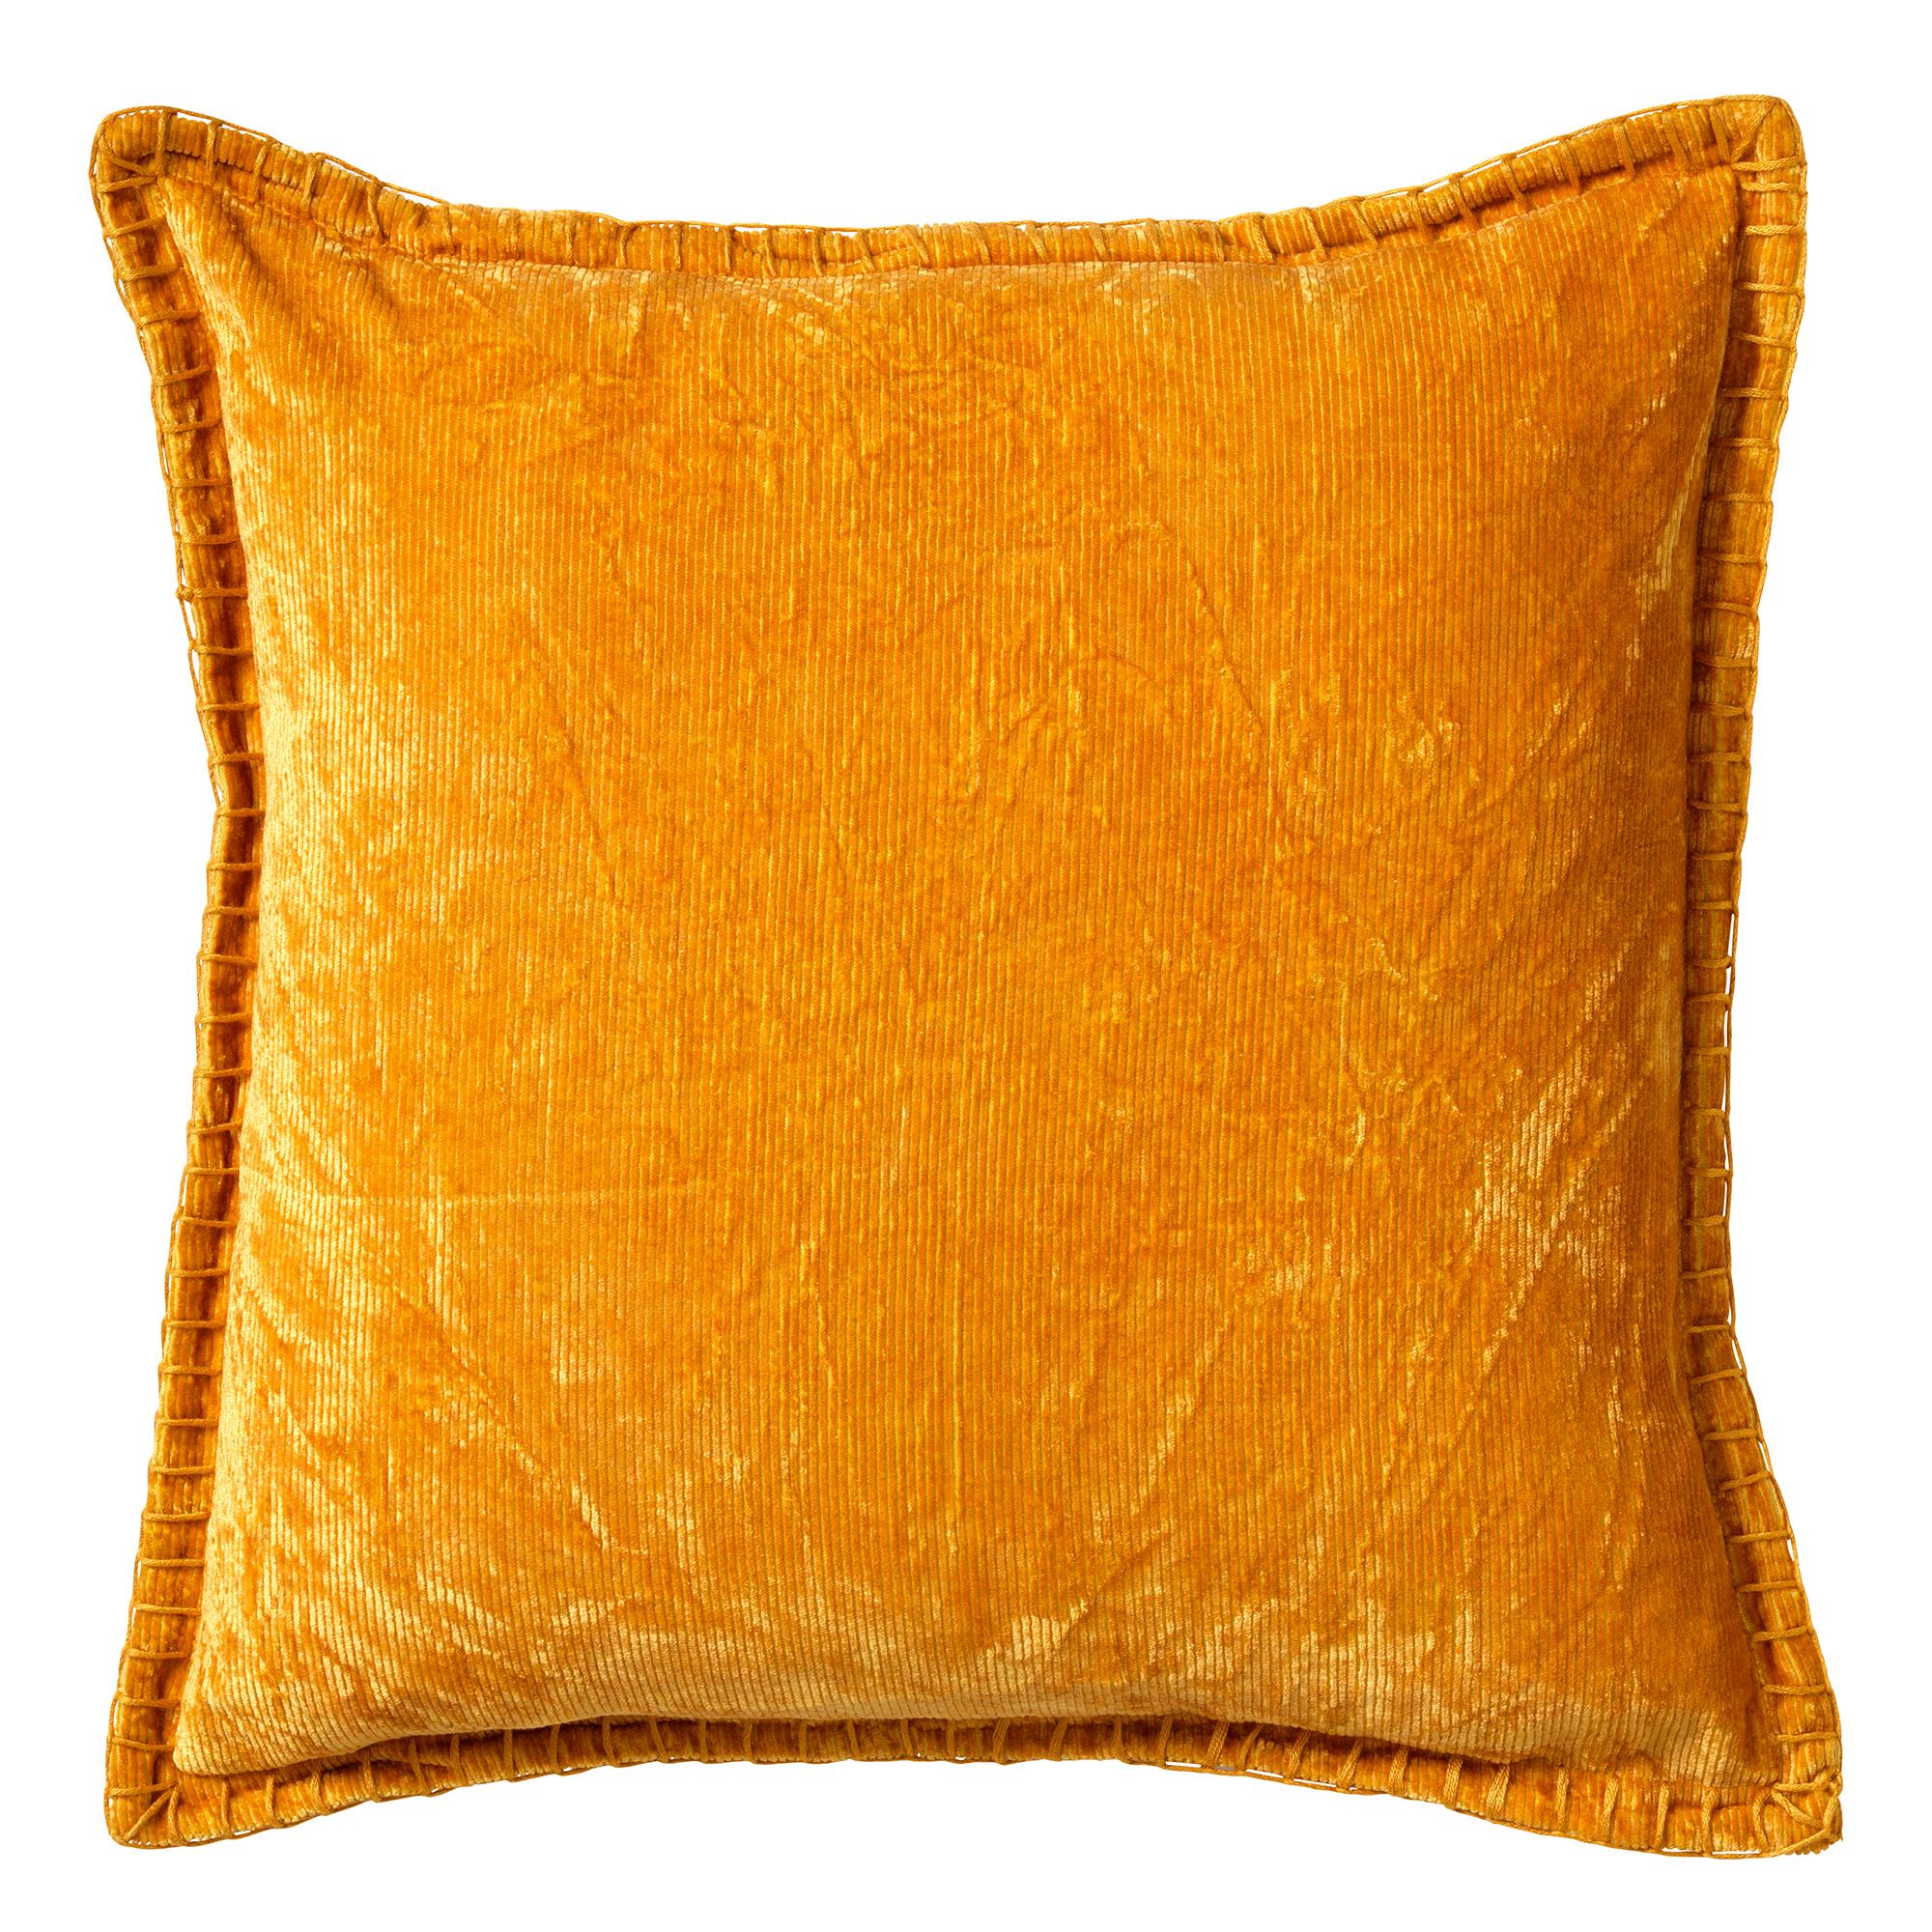 REBEL - Sierkussen velvet 45x45 cm Golden Glow